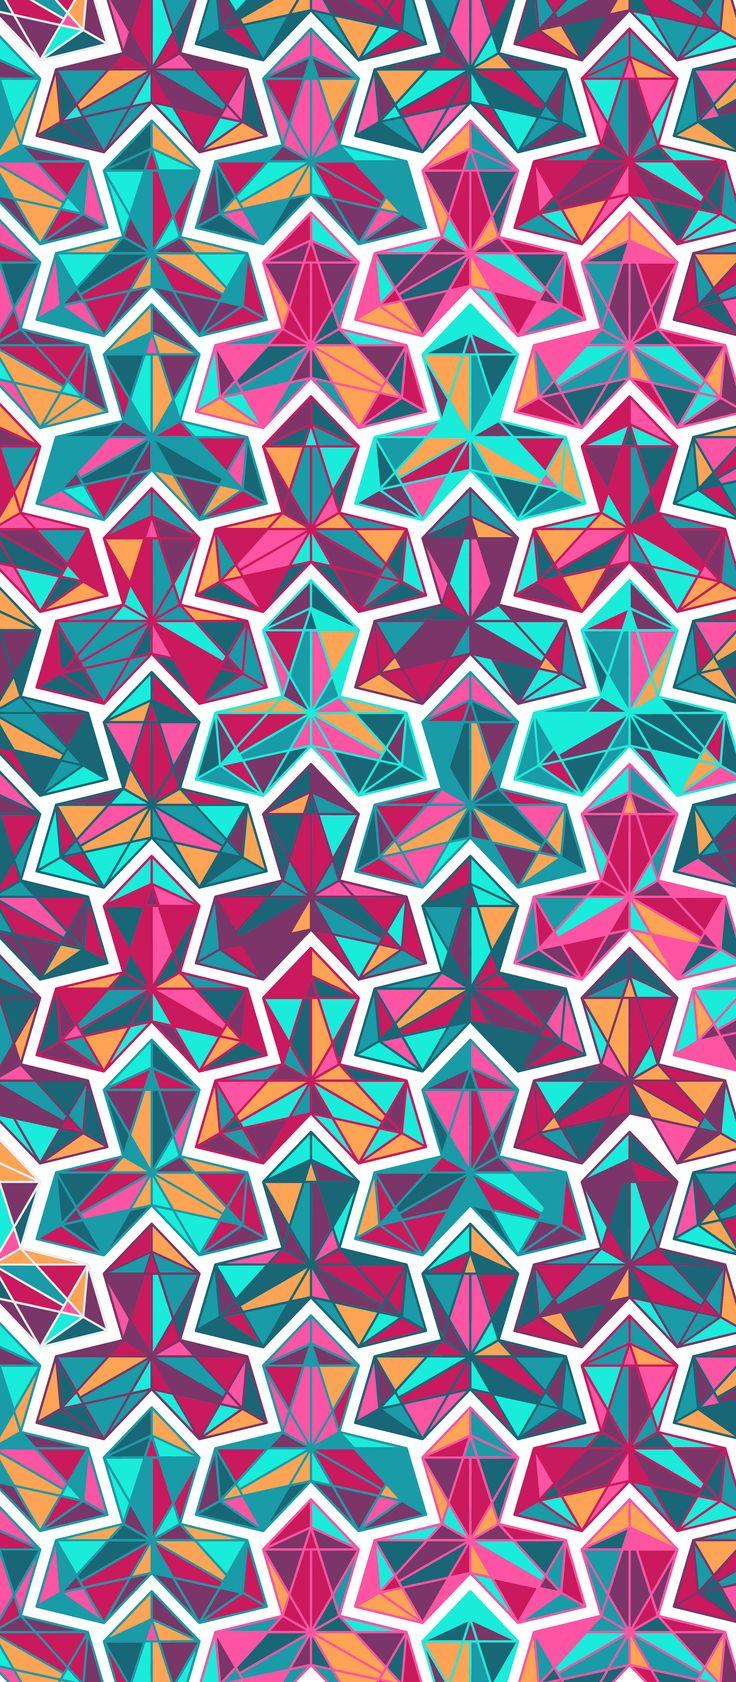 Russfussuk 'Lucid' M10A #pattern #patterndesign #surfacepattern #patternprint #crystal #rainbow #jewel #generative #geometria #padrões #russfussuk